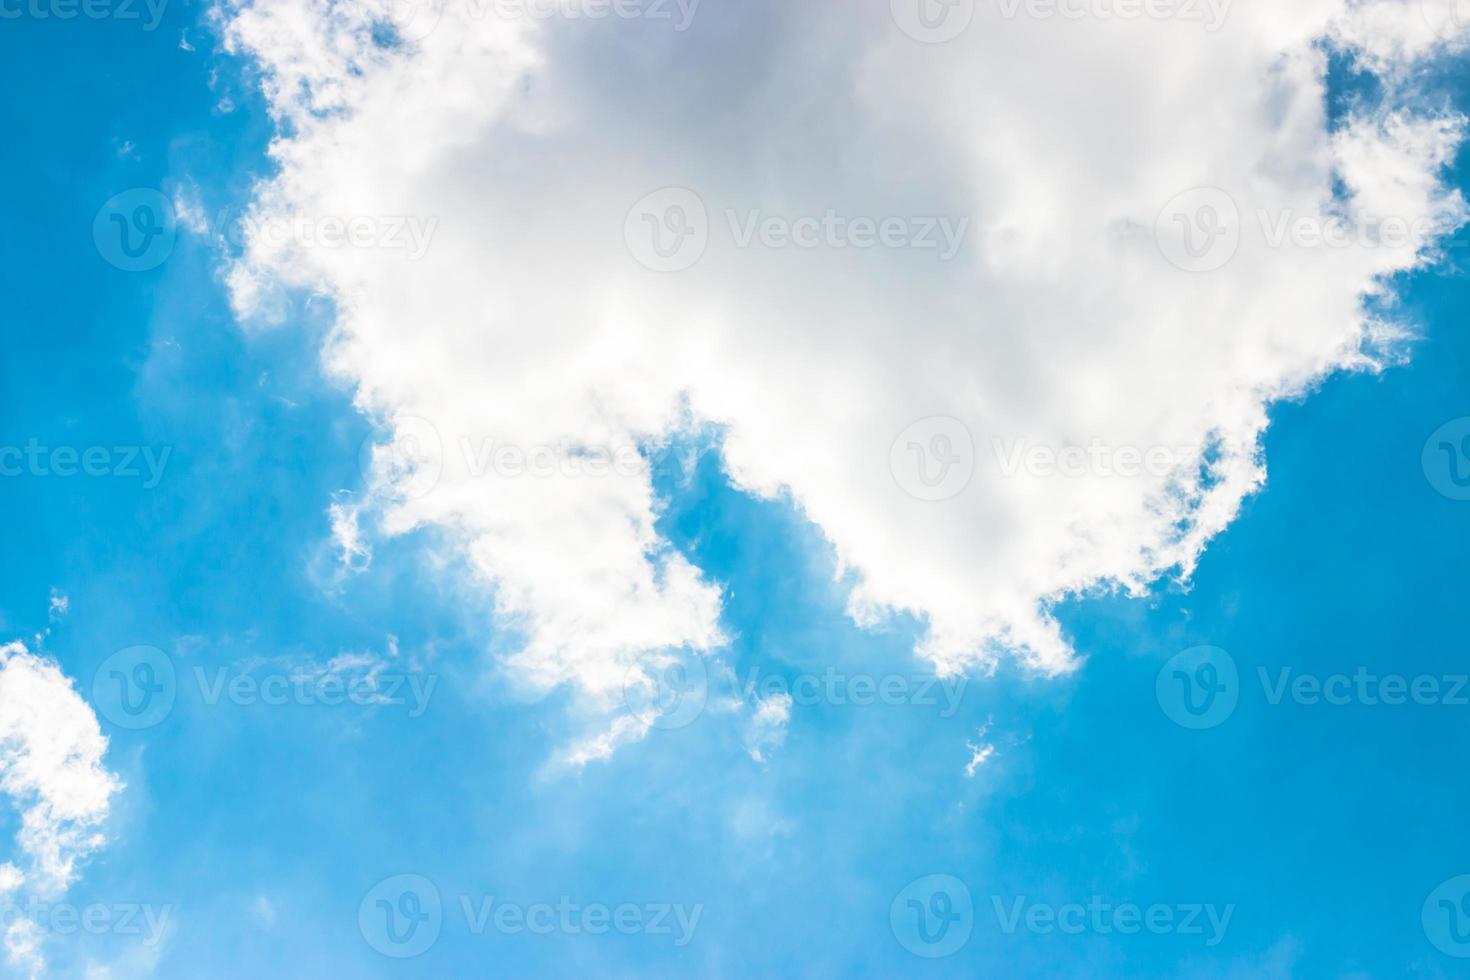 bule hemelachtergrond foto